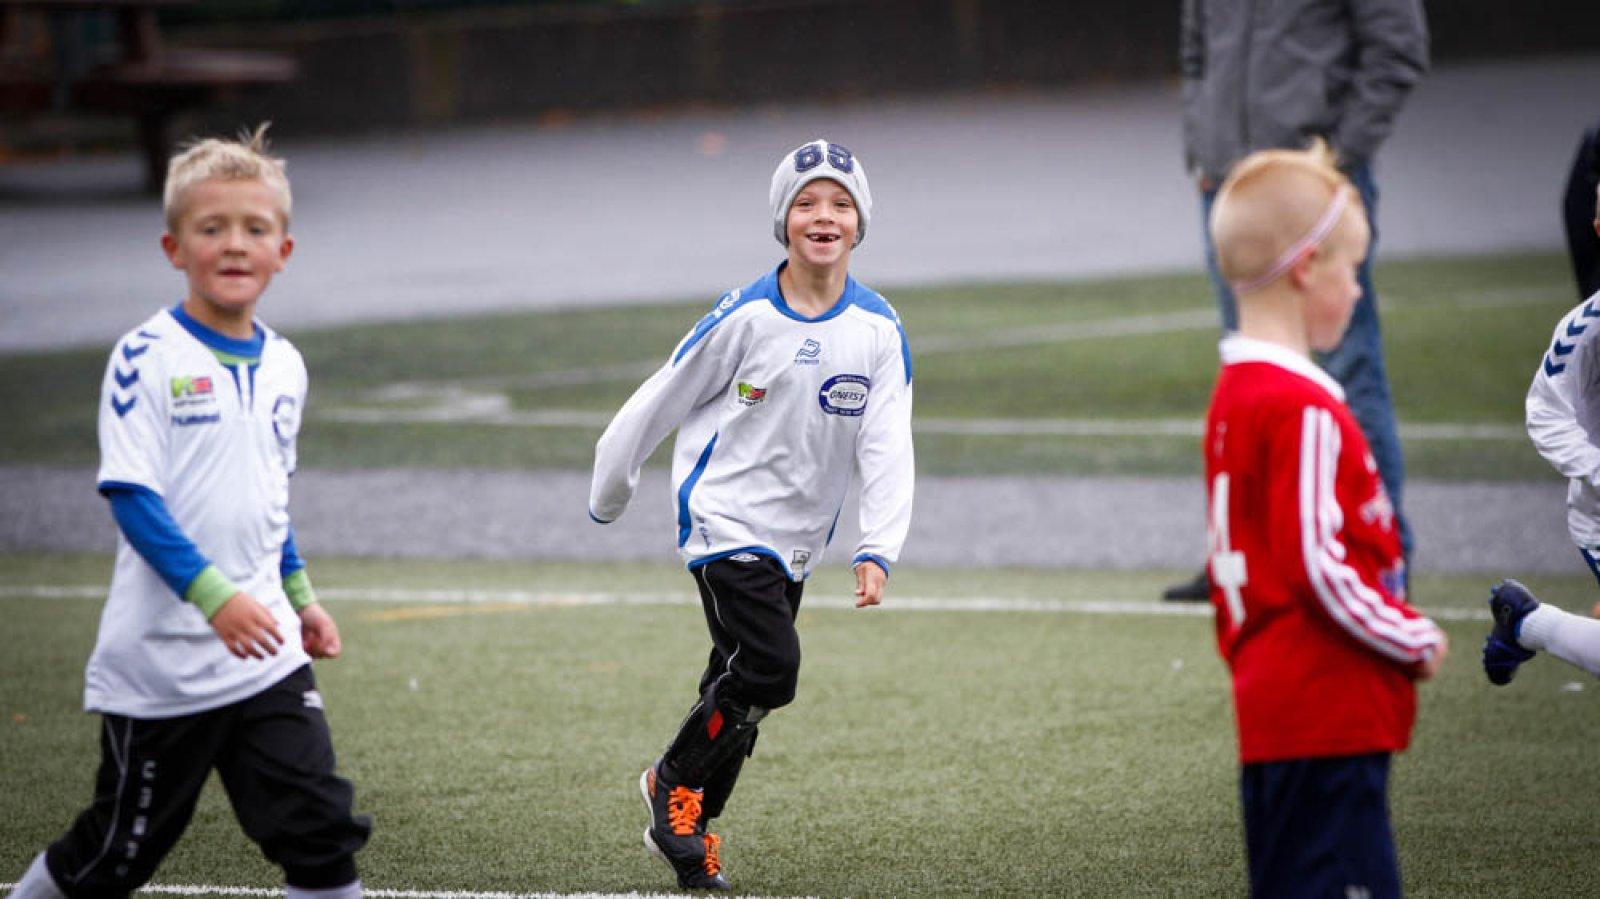 Brann Sparebanken Vest Cup 2016: Kevin (7) jubler etter Gneist-scoring